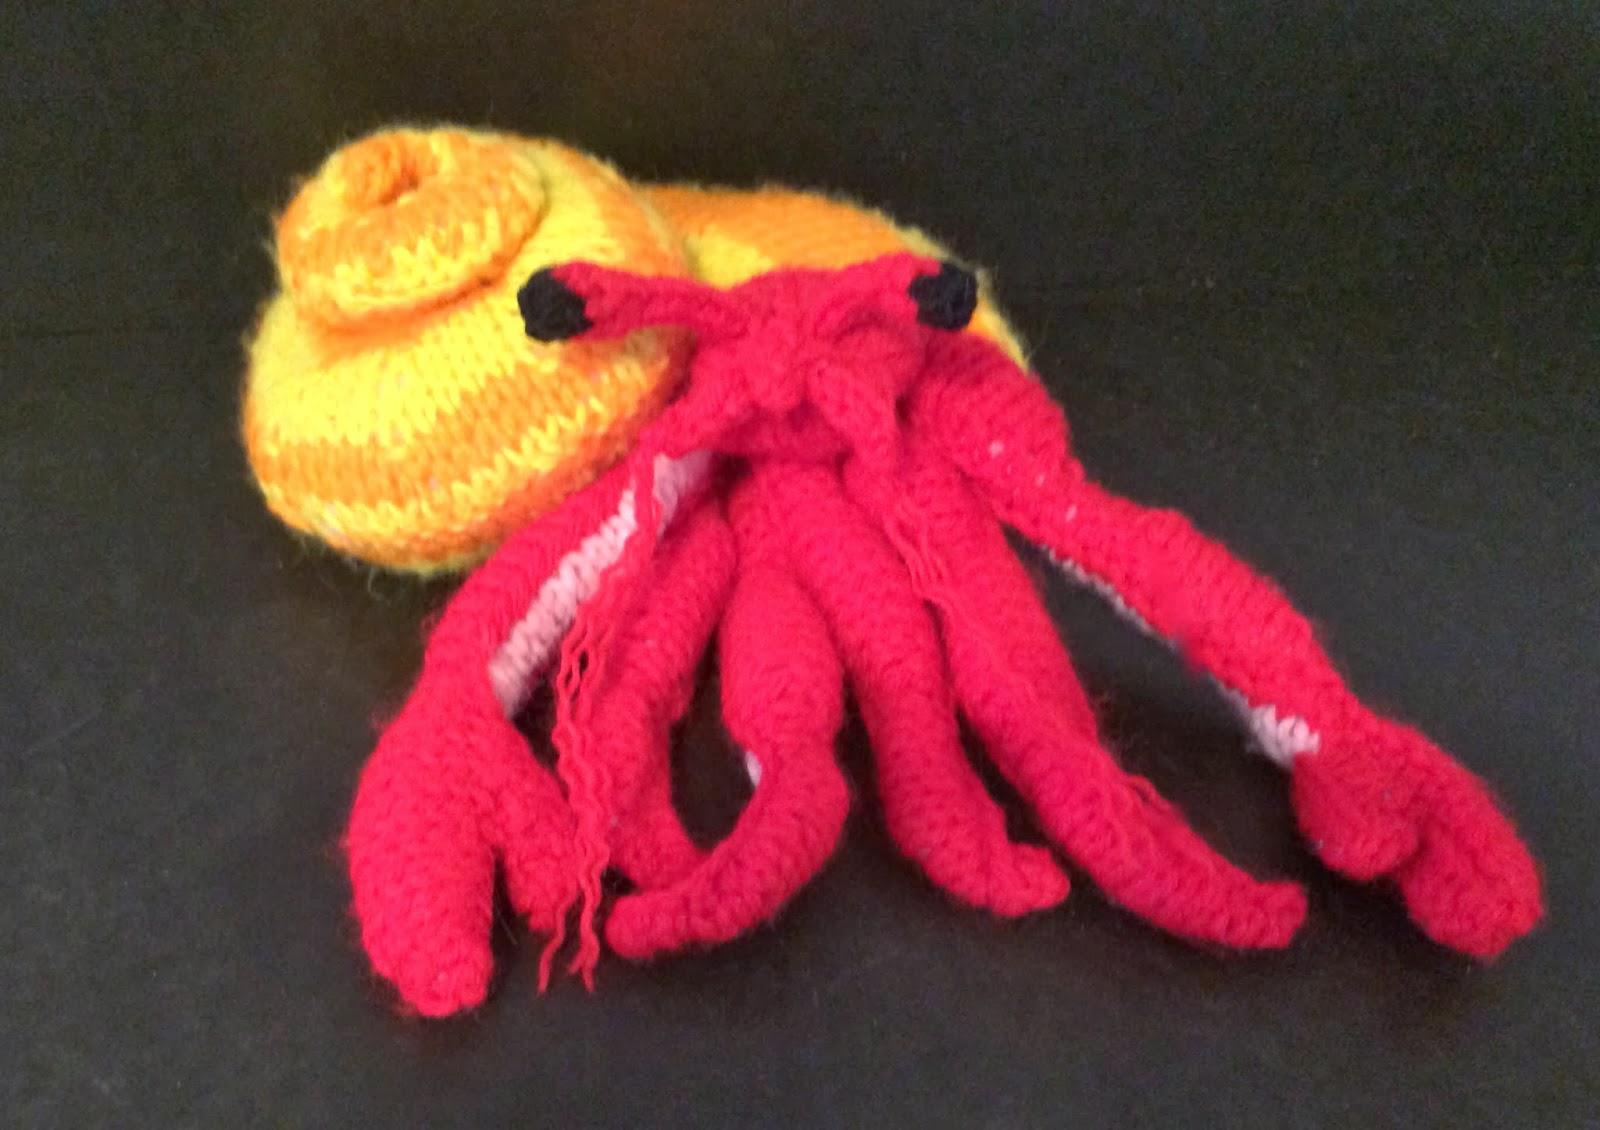 Amigurumi Hermit Crab : Knitskatoon: October 2013